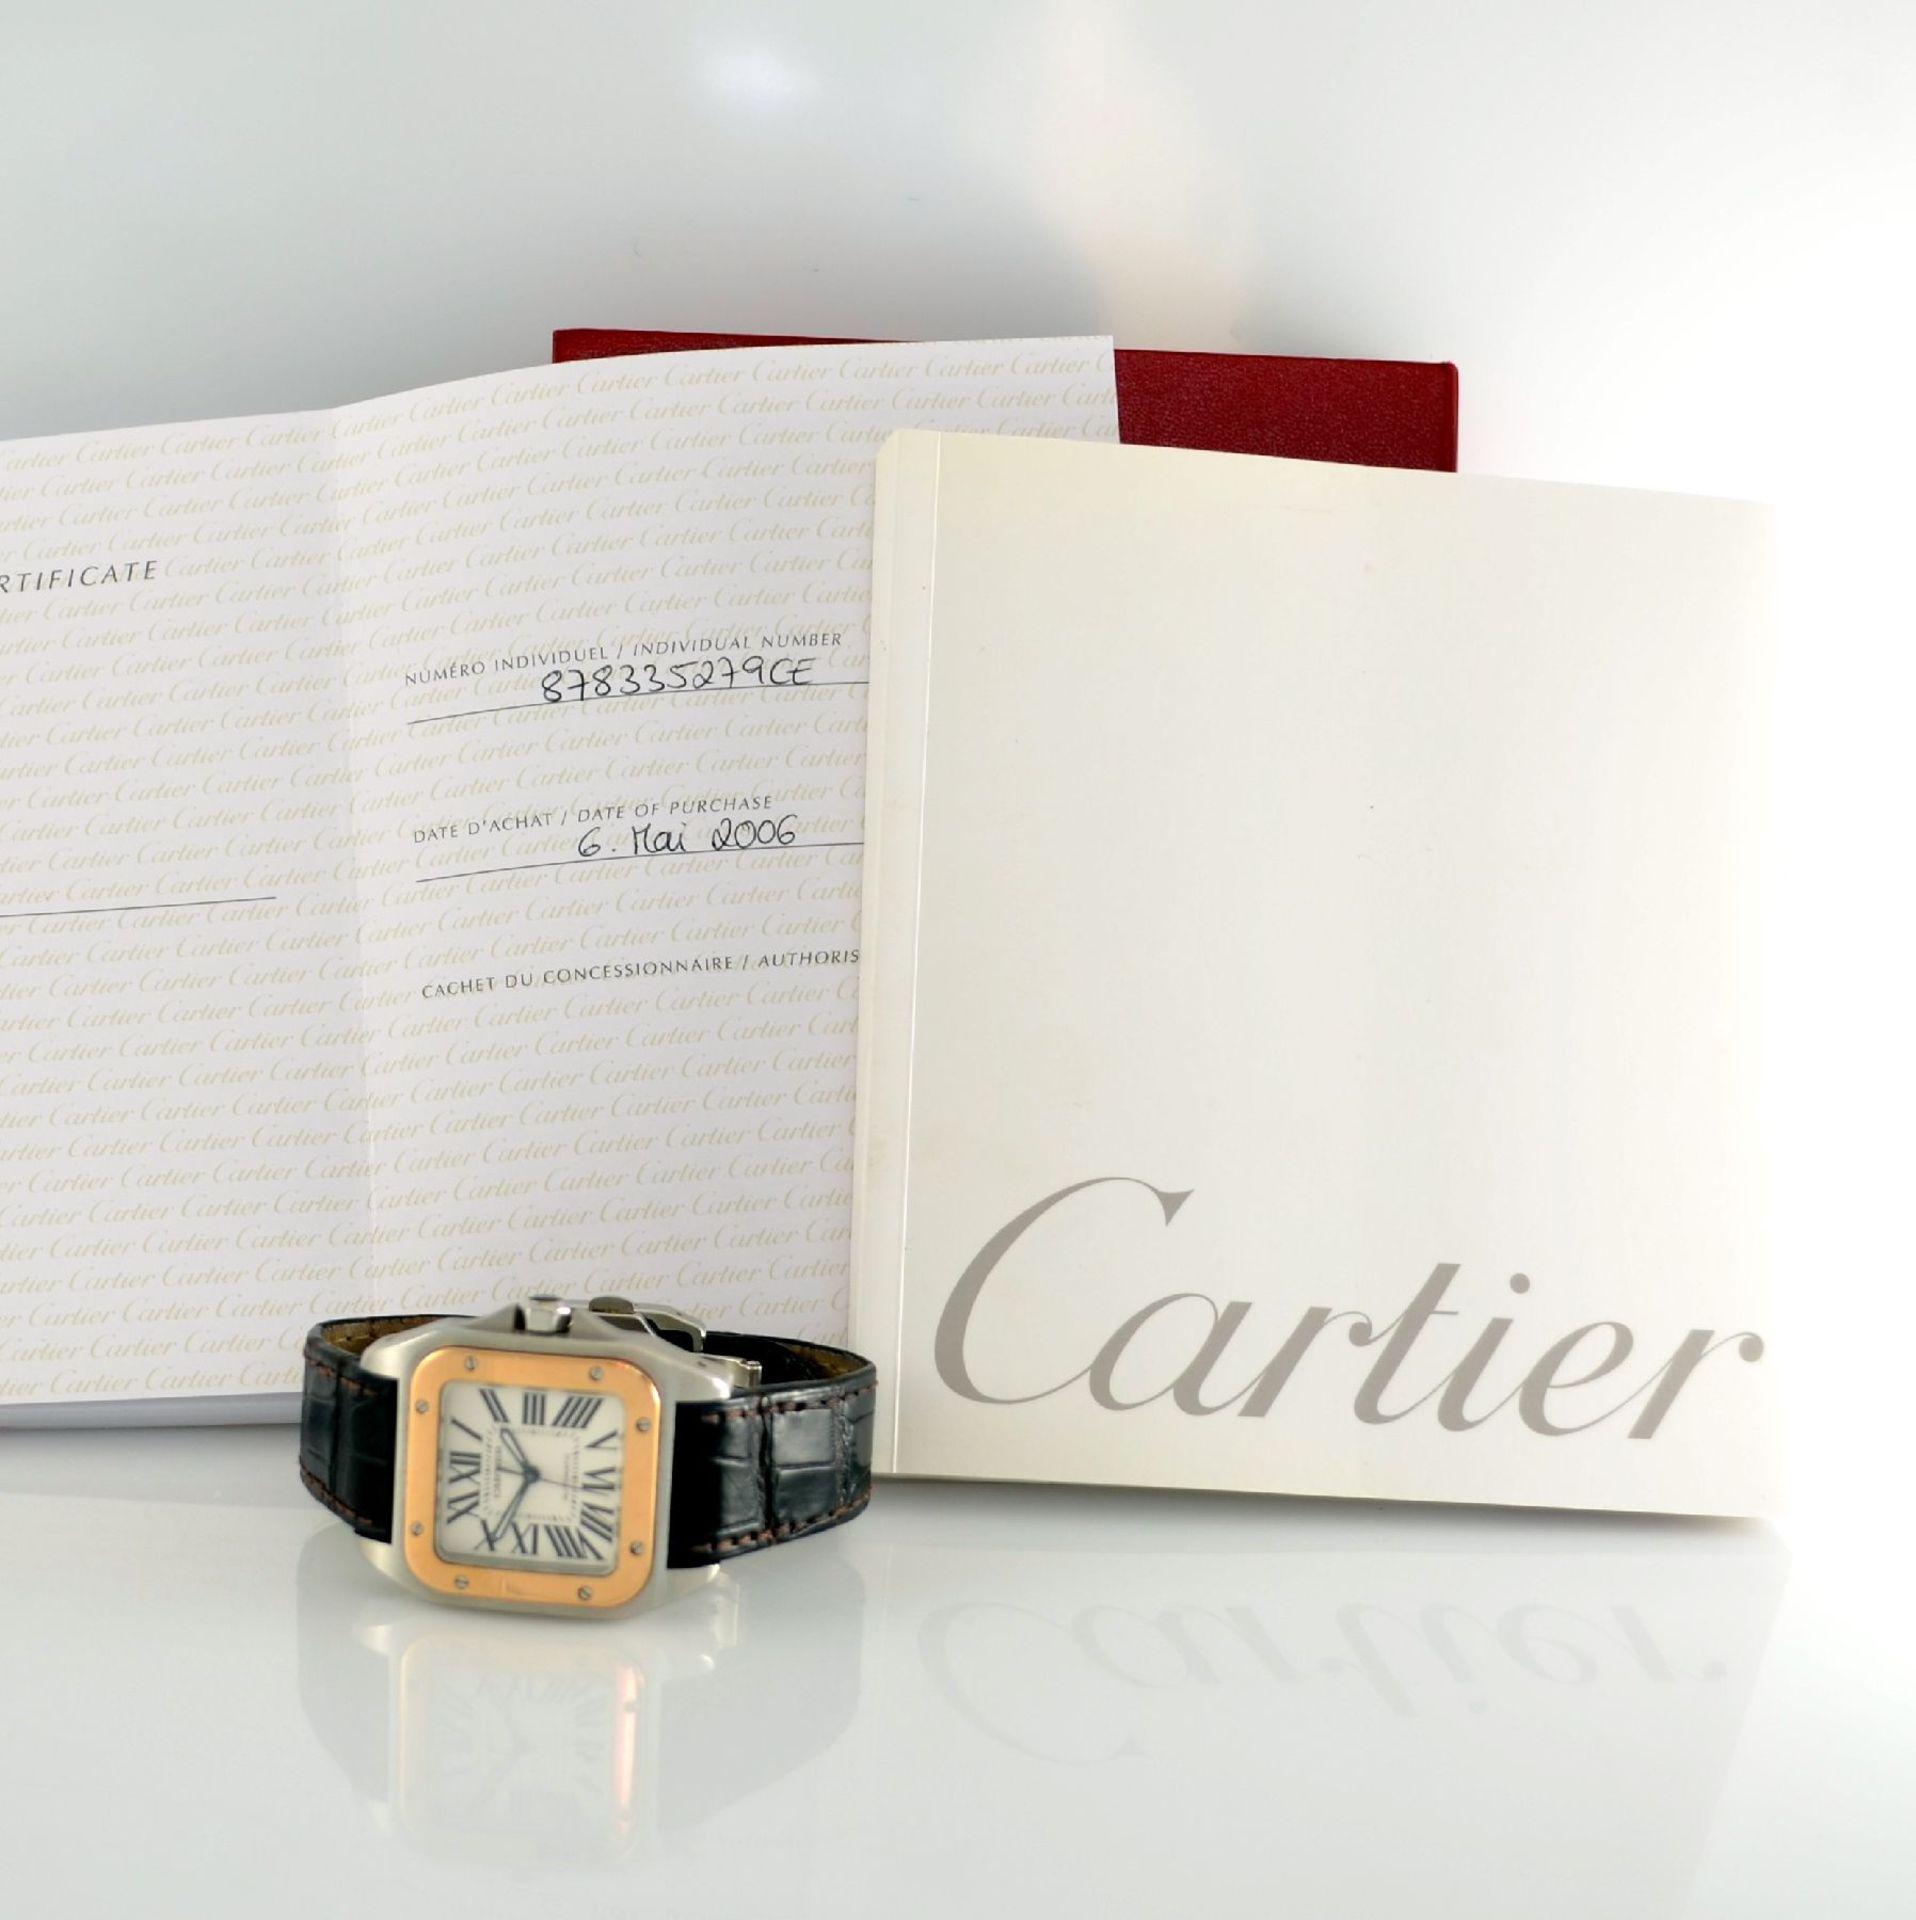 CARTIER Santos 100 Armbanduhr in Edelstahl & RoseG 750/000, Schweiz um 2006, Automatik, Boden 8-fach - Bild 7 aus 7